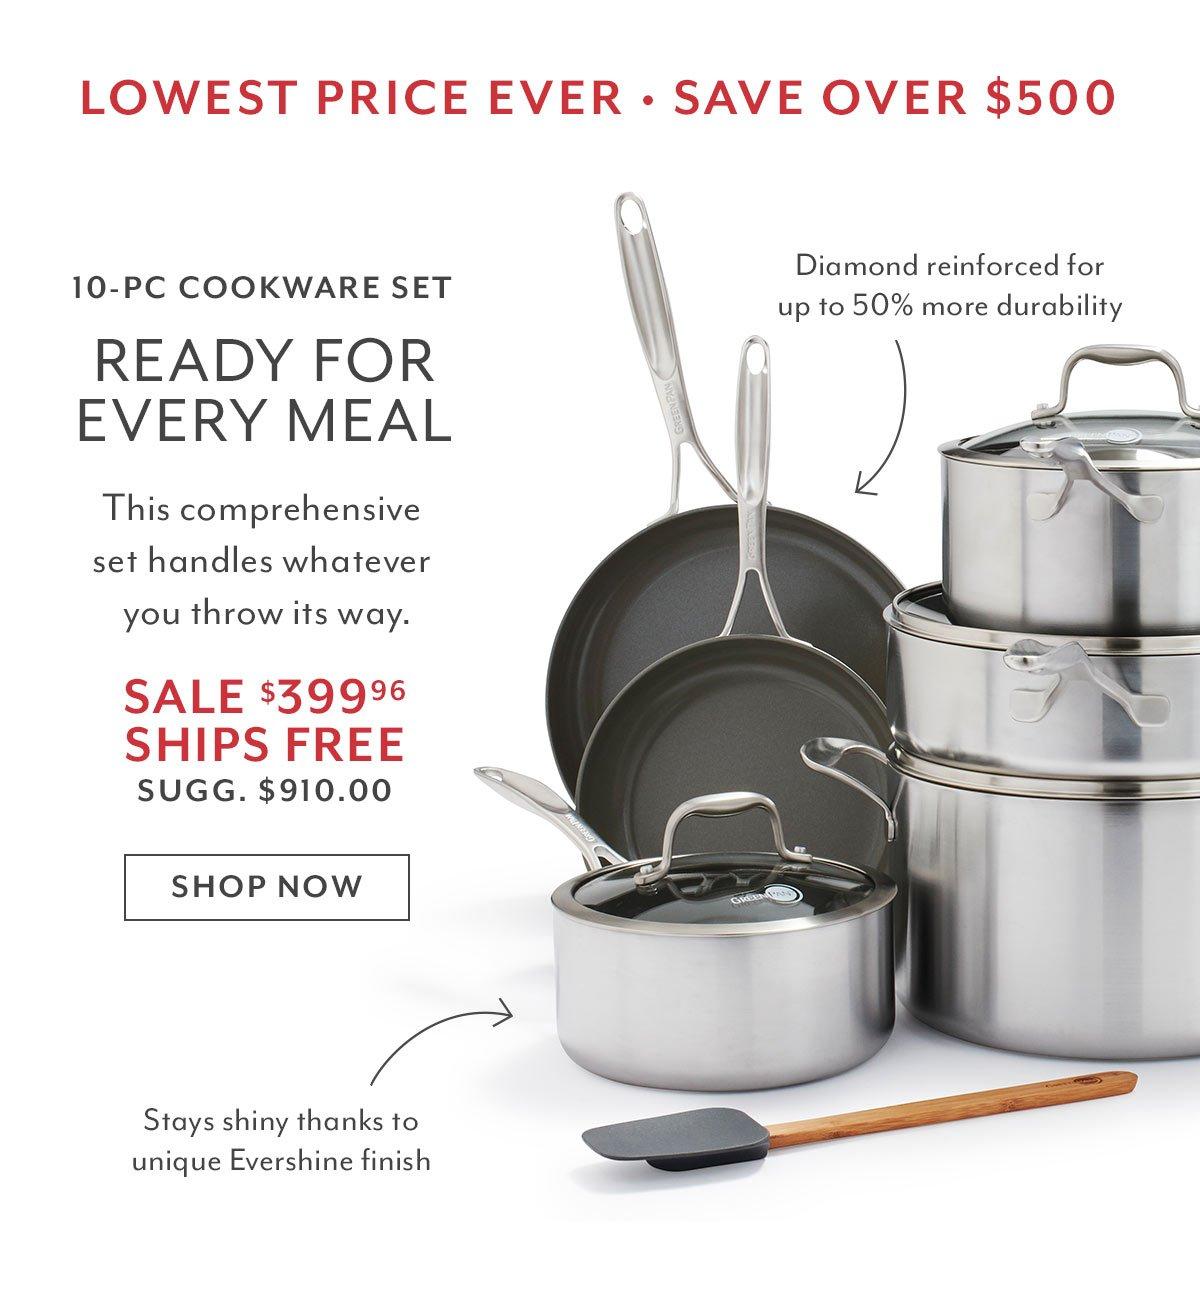 Greenpan Diamond + Evershine 10-PC Cookware Set • Save Over $500